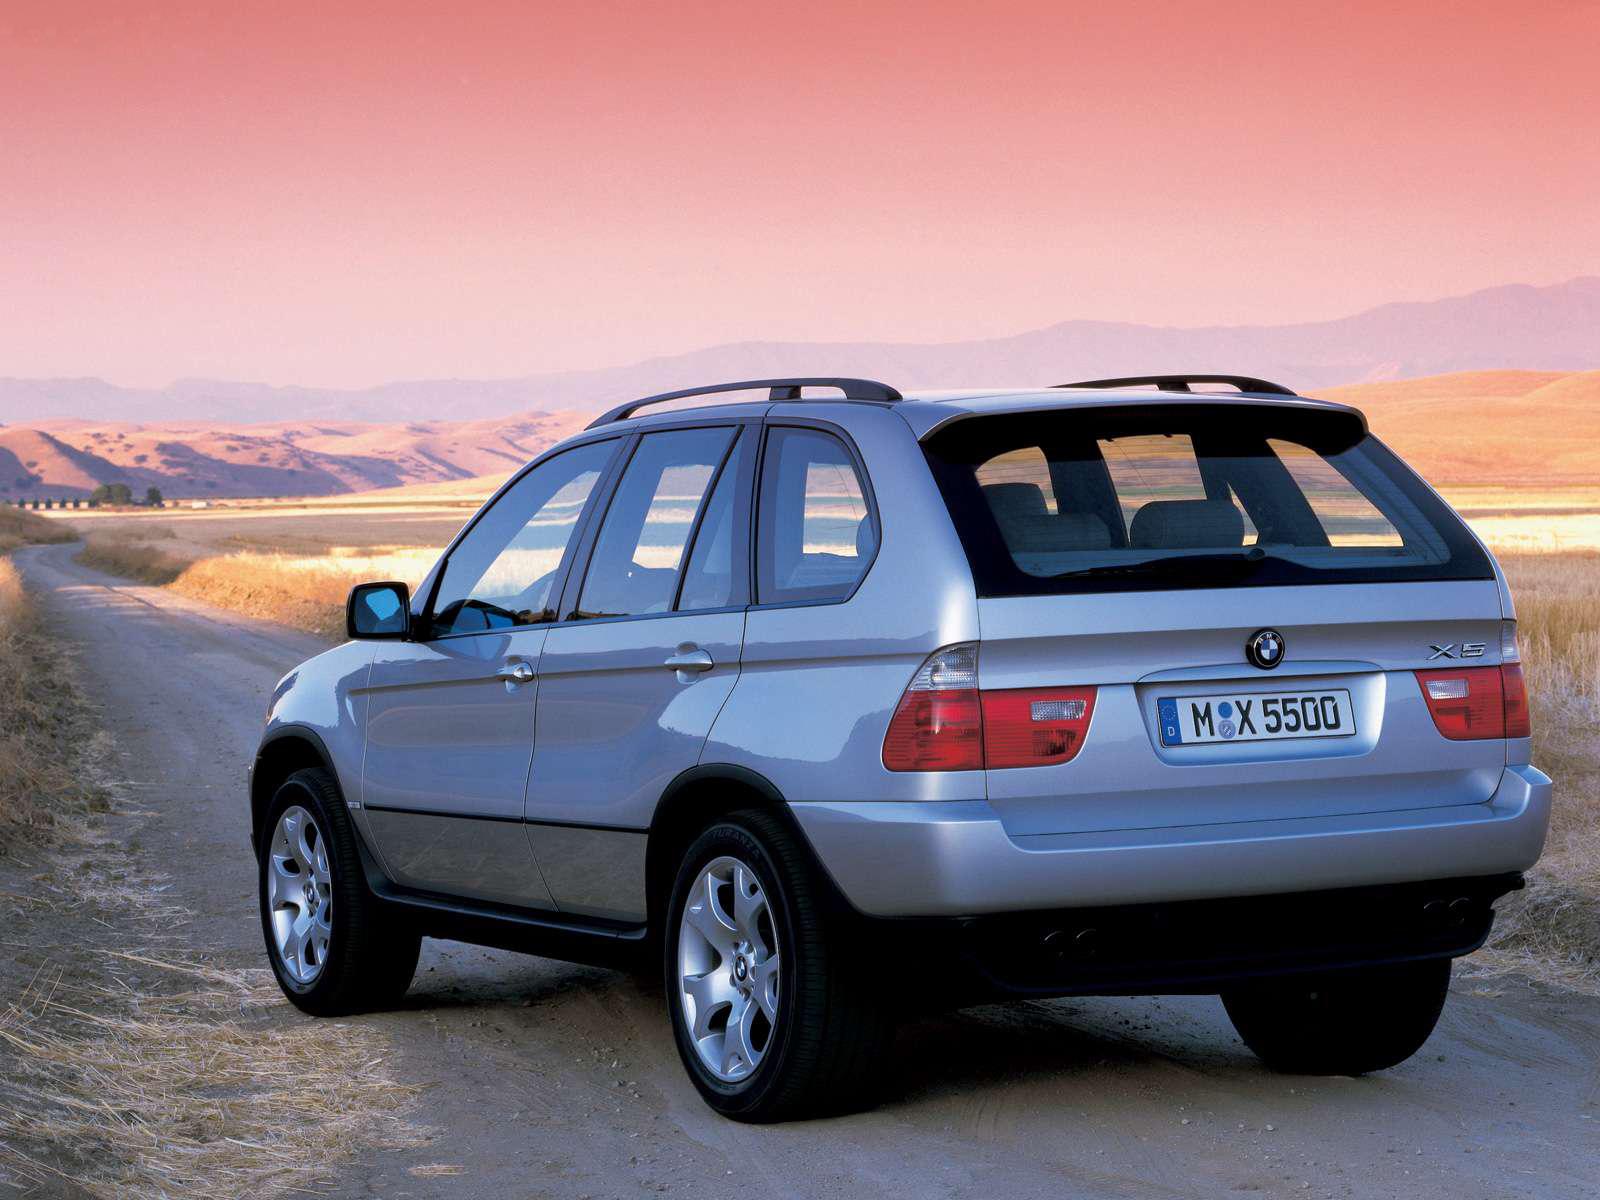 BMW X5 I (E53) 1999 - 2003 SUV 5 door #4